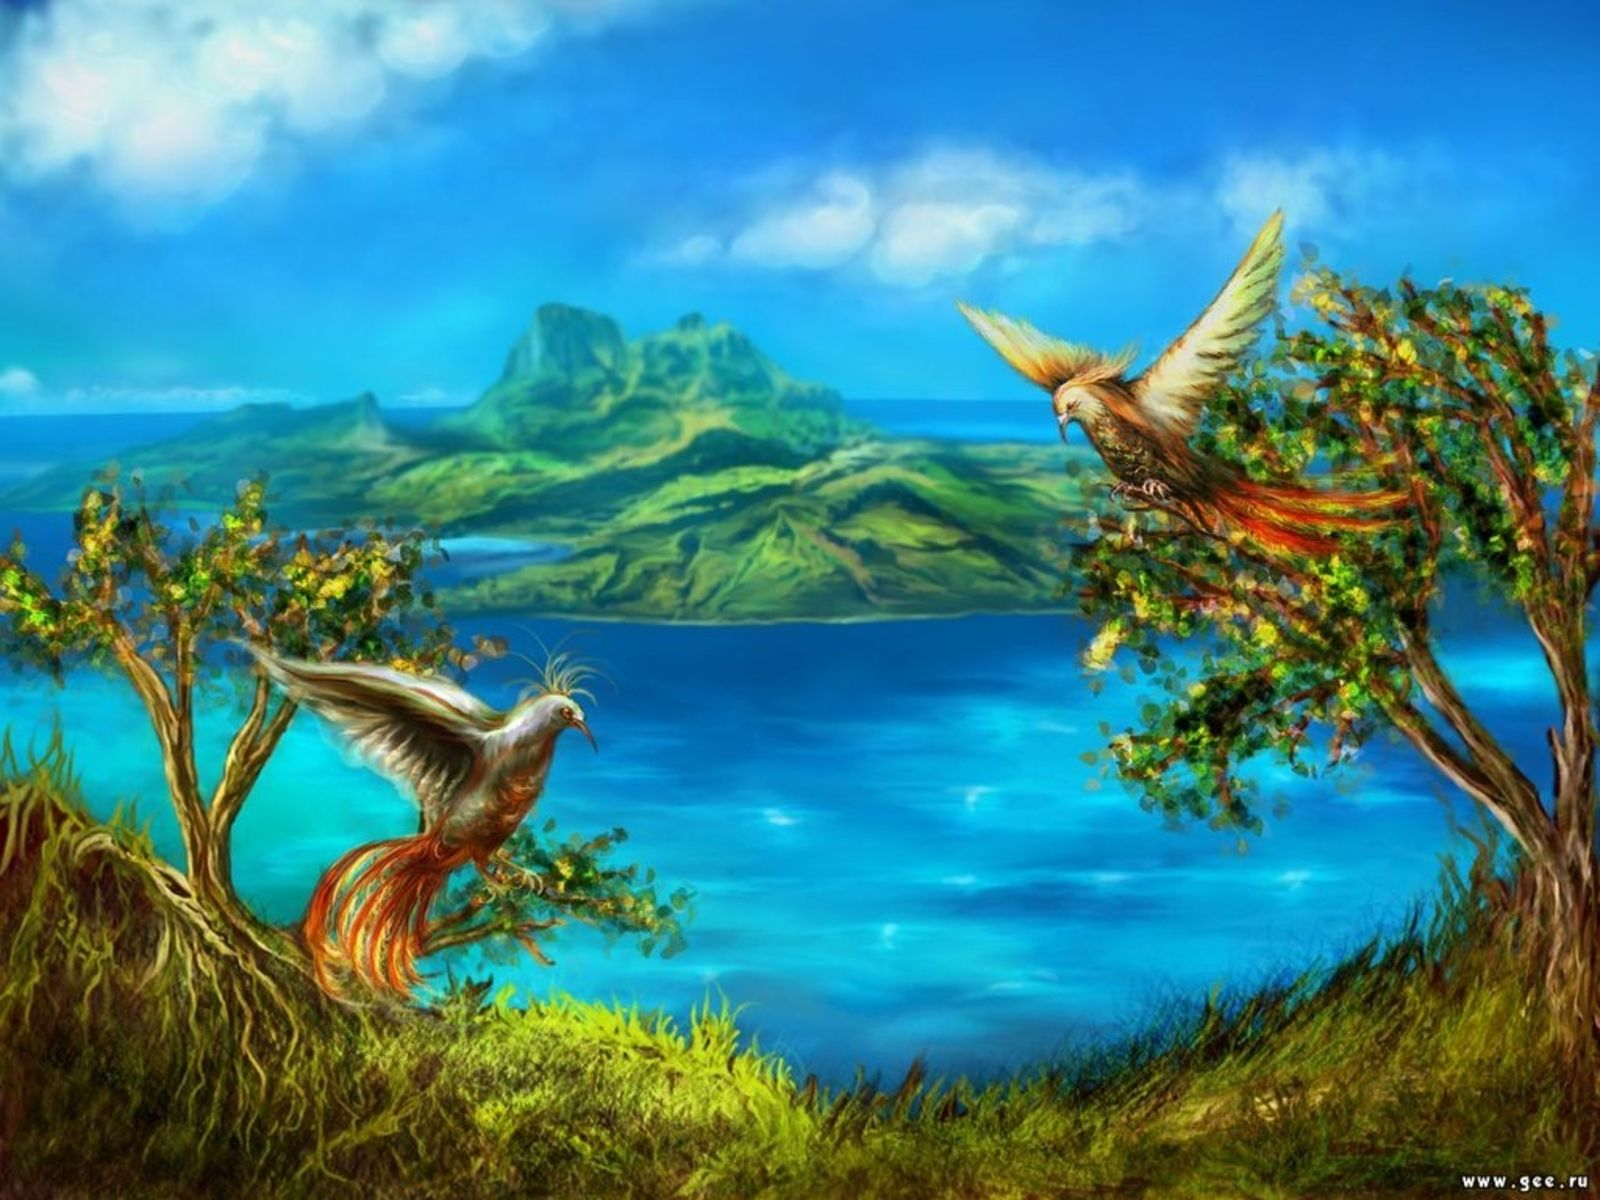 Nature Art Desktop Wallpaper Hd Wallpapers